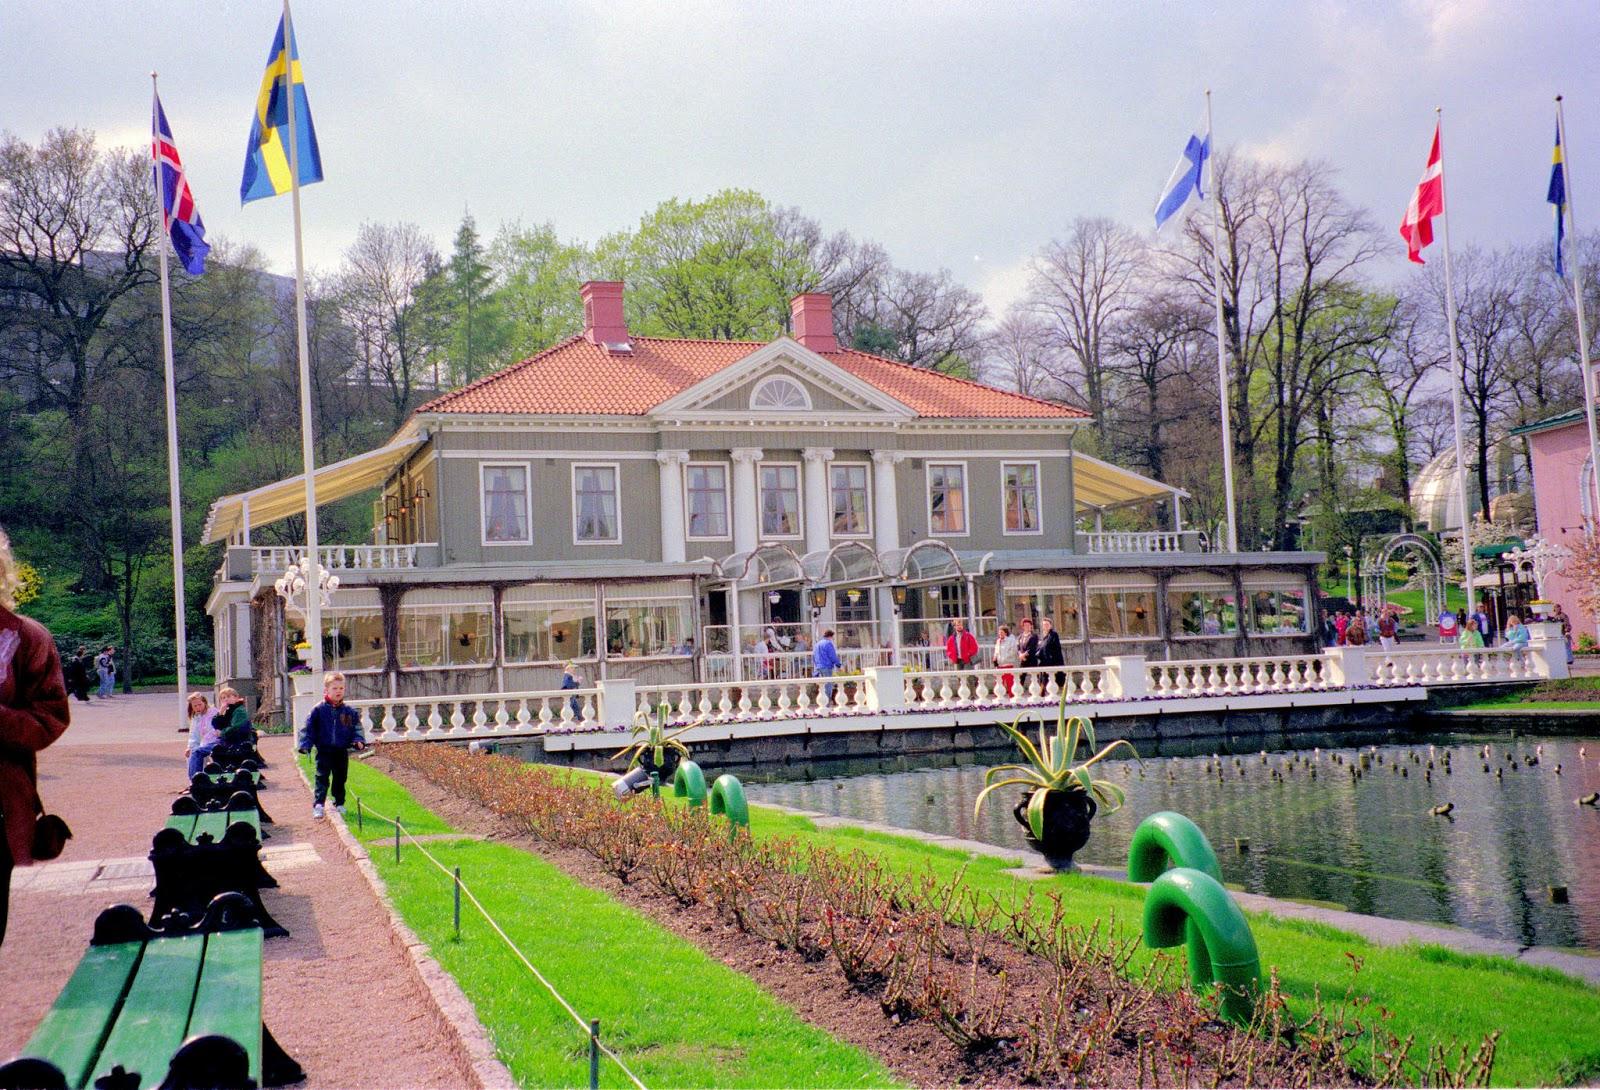 Gothenburg Fun Park